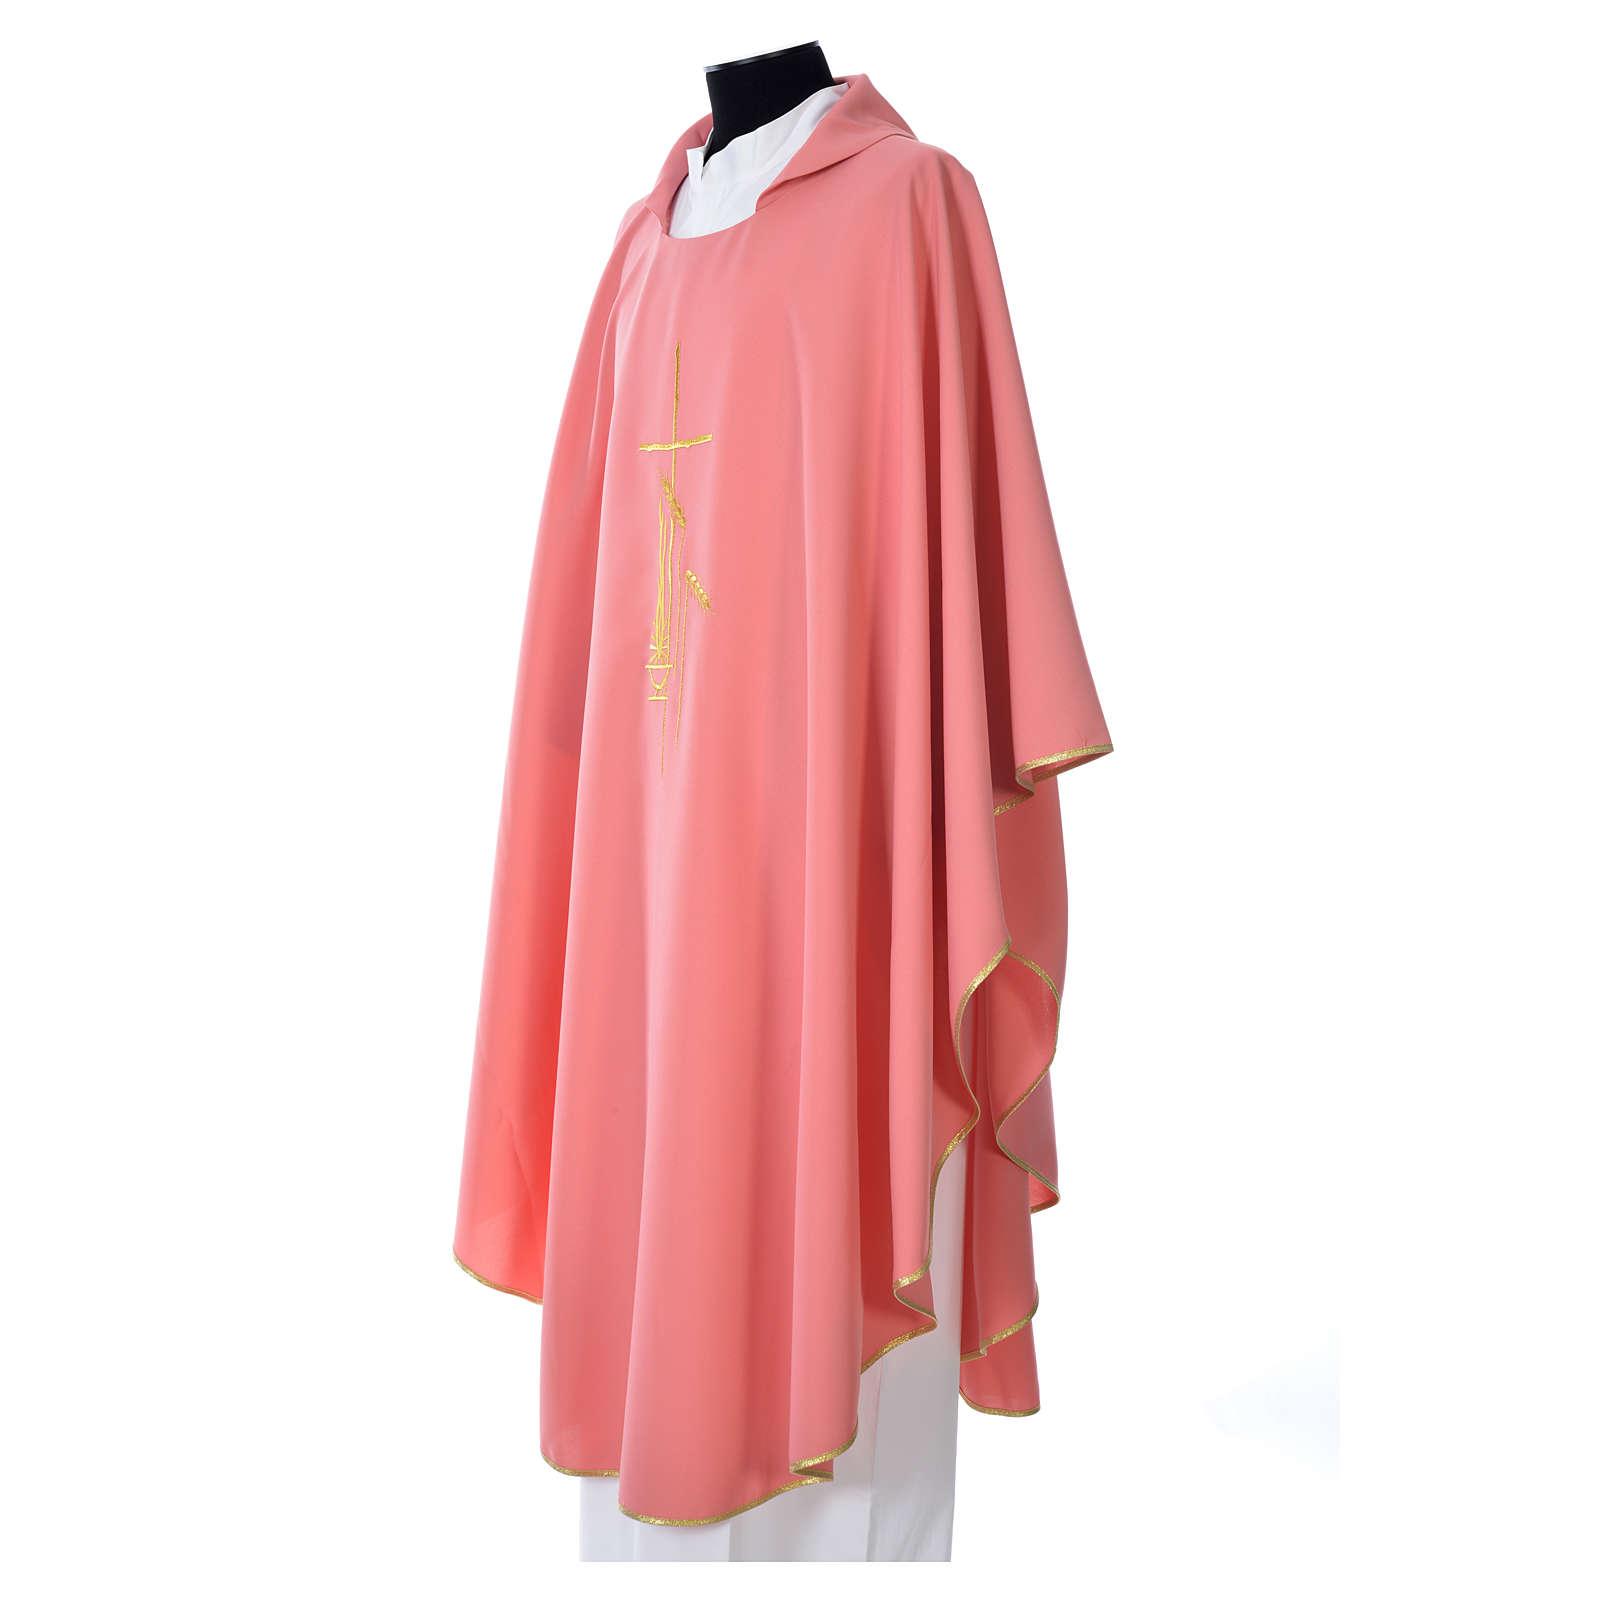 Casulla rosada poliéster cruz delicada espigas 4